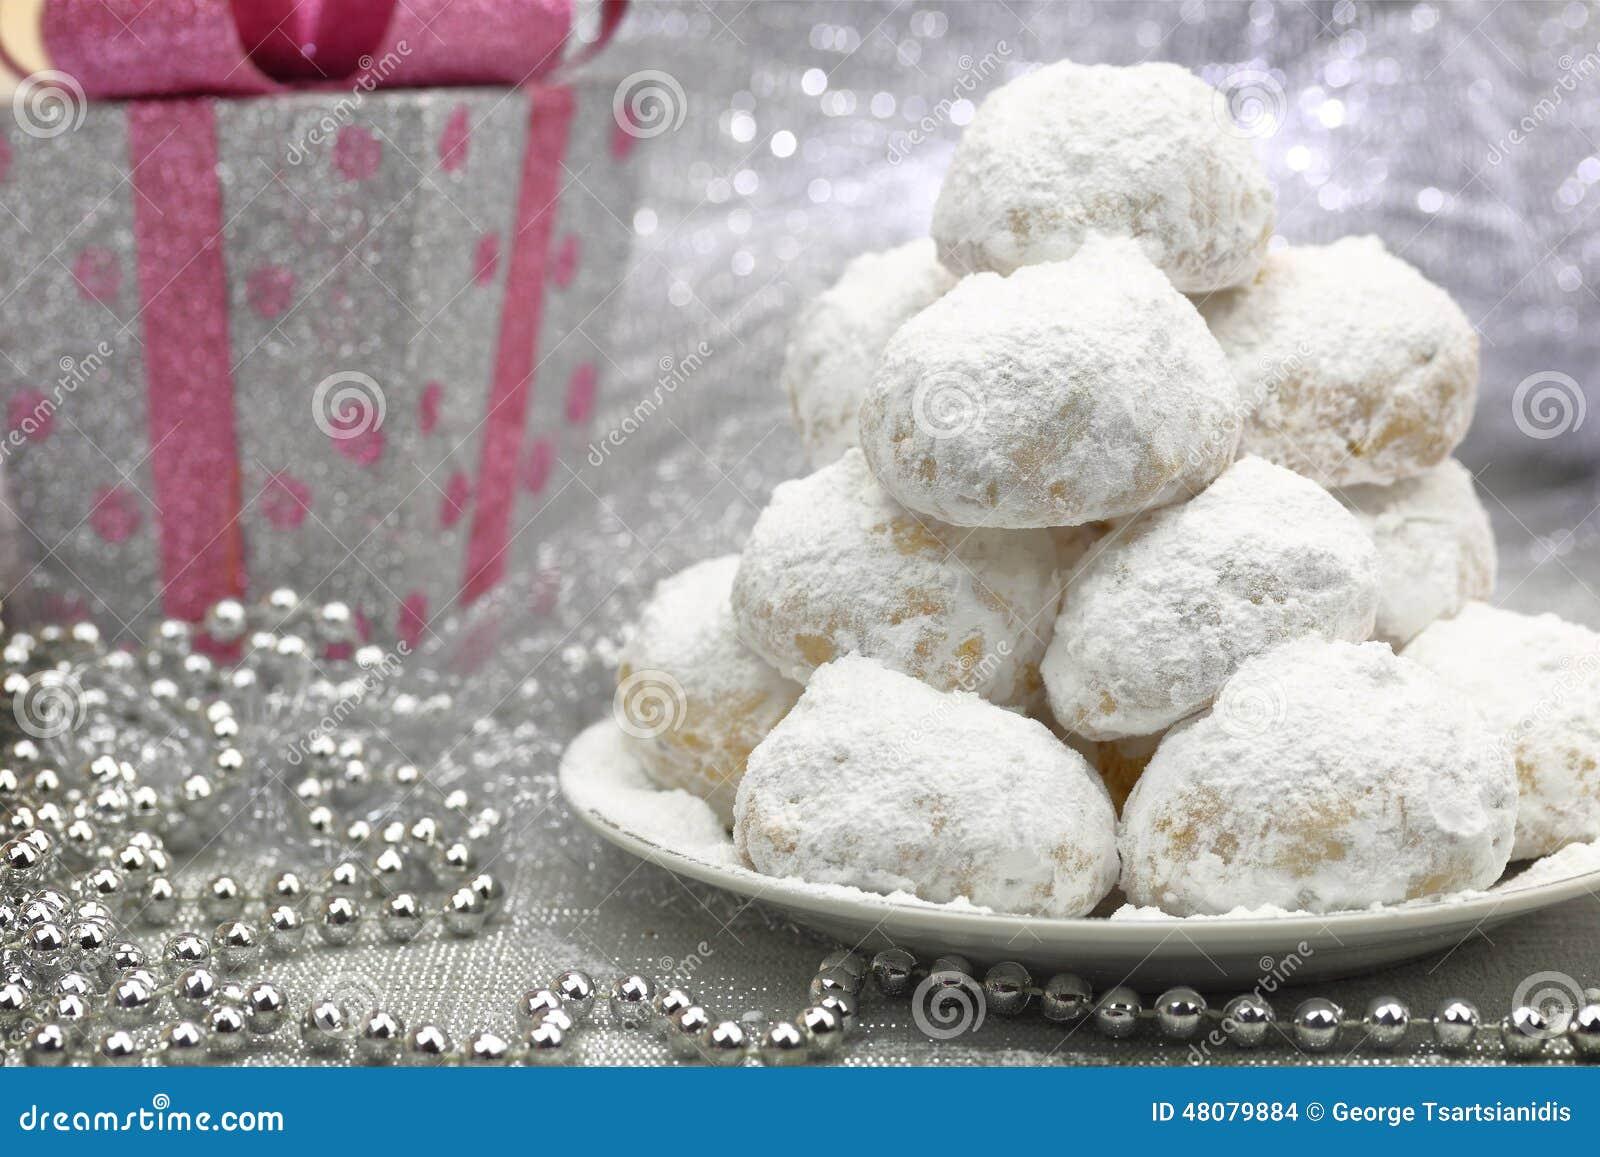 Free Images Pattern Holiday Baking Toy Pastry Dough Bake Christmas Cookies Recipes Joyofbaking